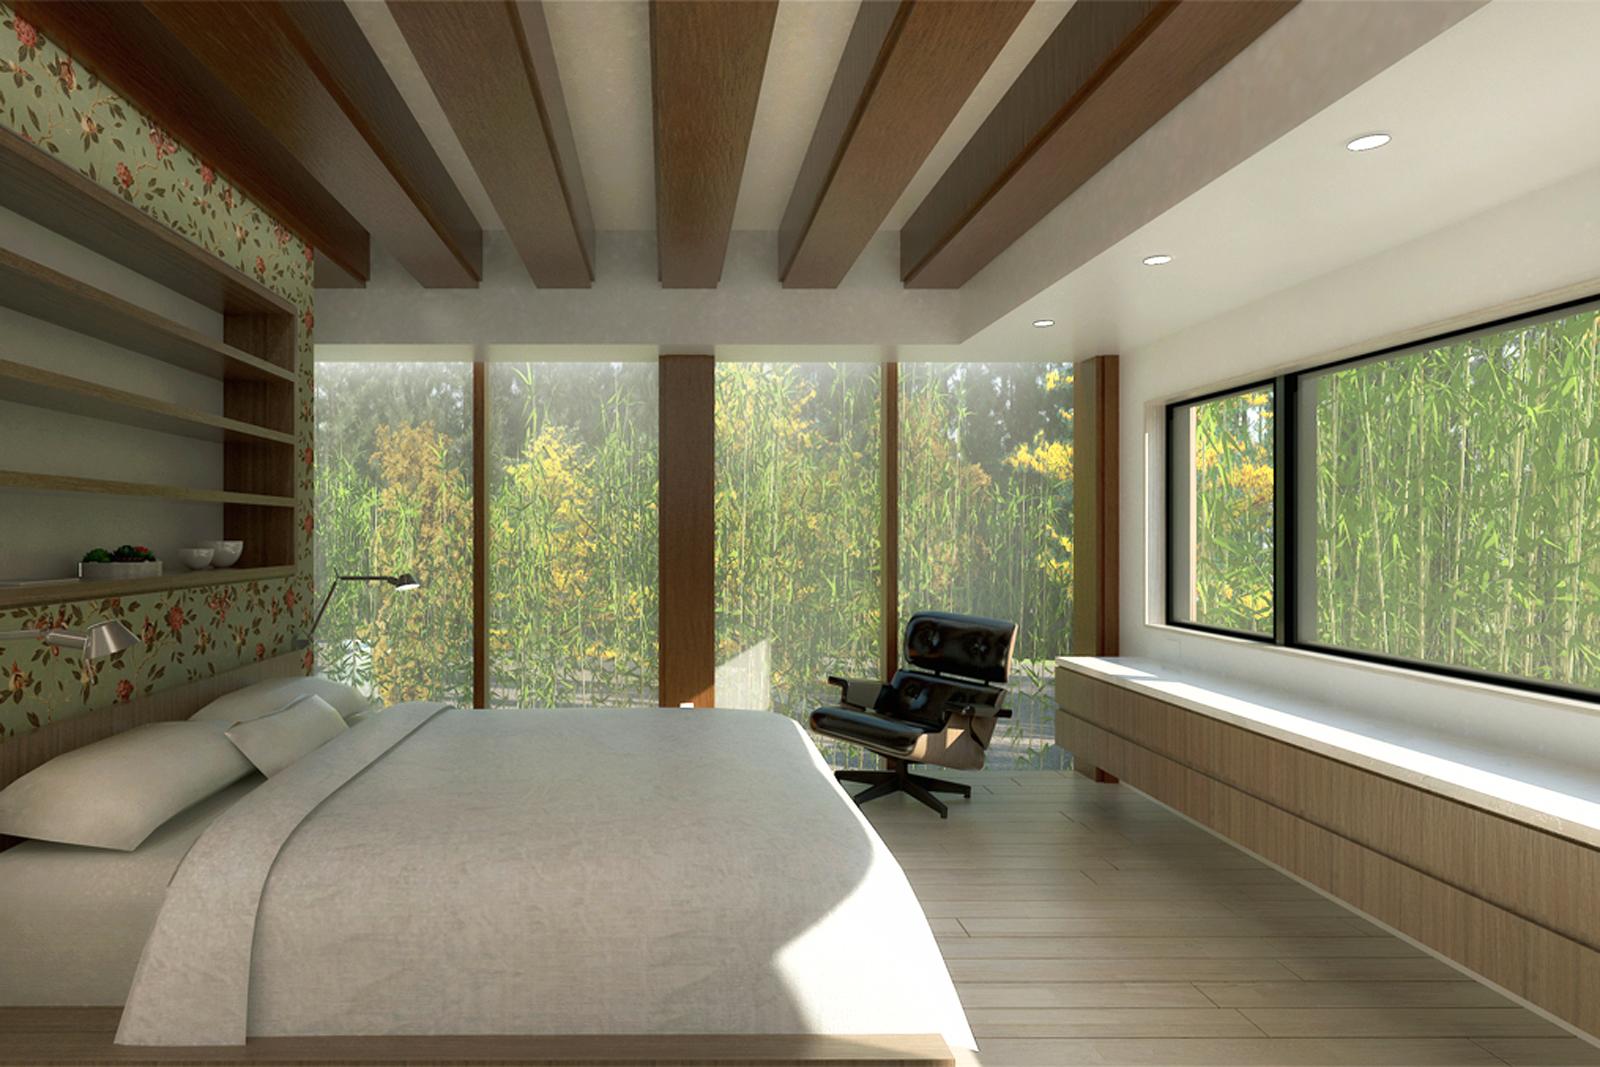 05_Fenimore-master-bedroom.jpg